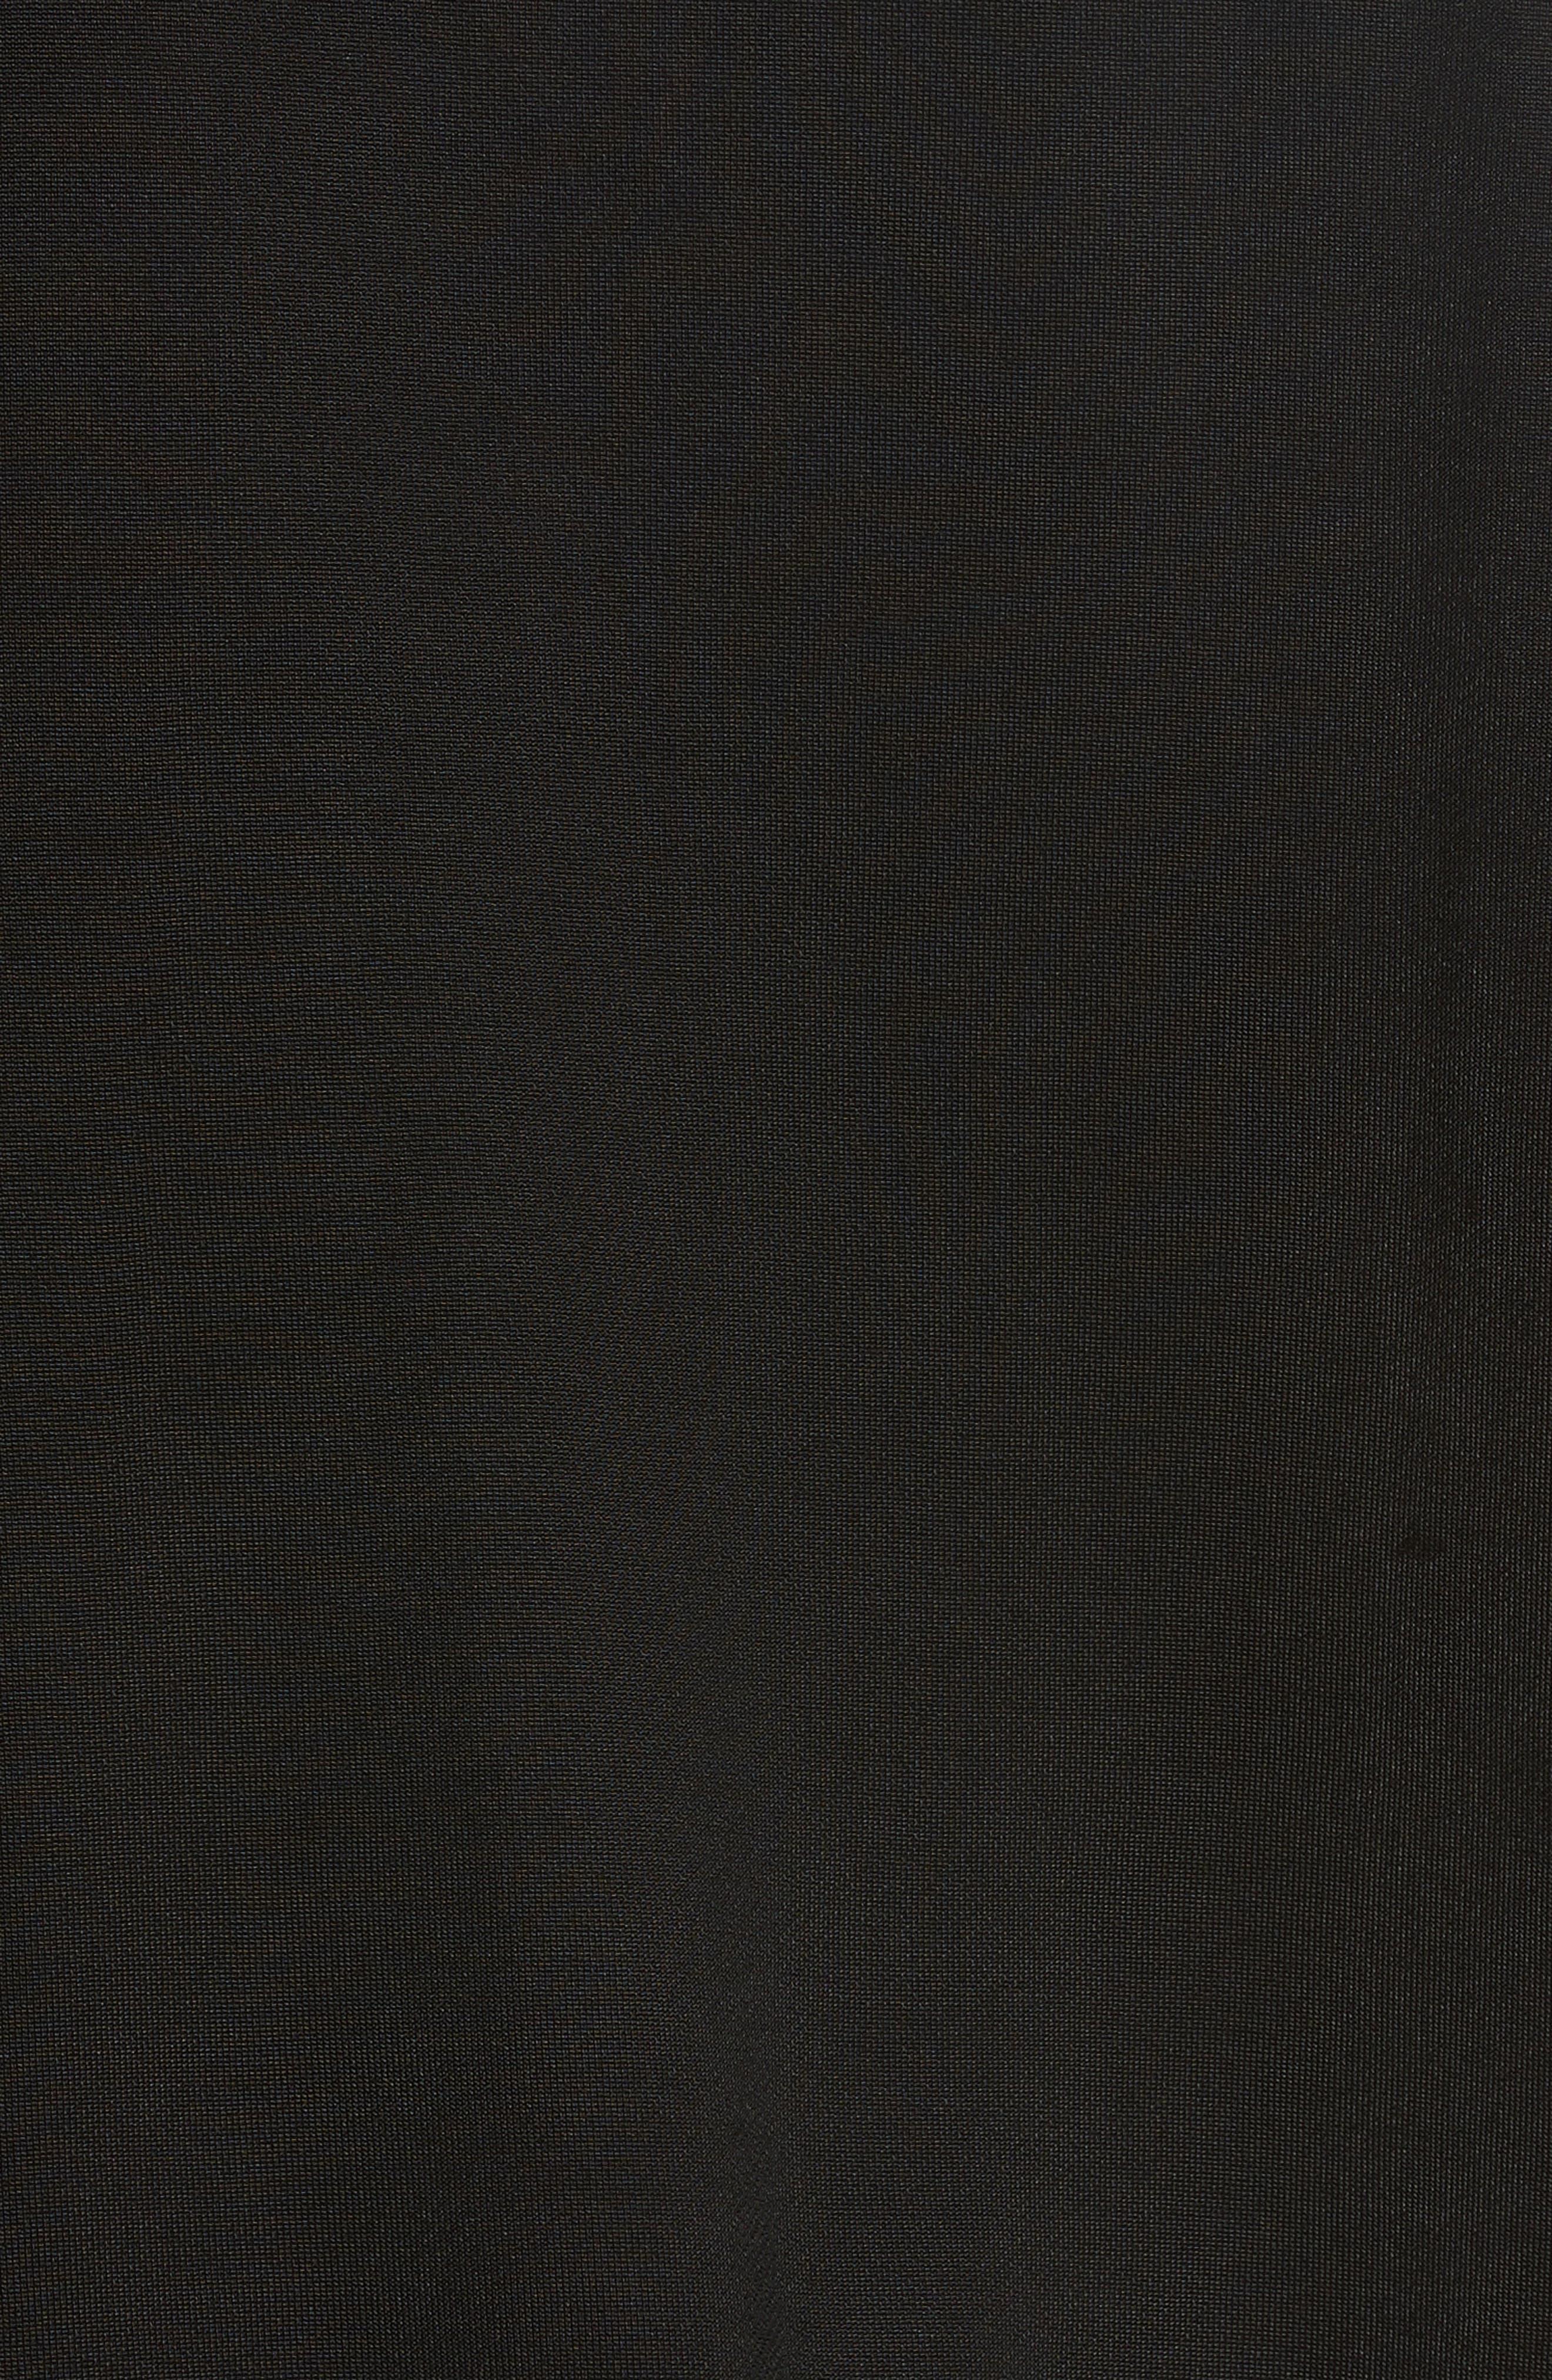 French Terry Sweatshirt,                             Alternate thumbnail 7, color,                             Black